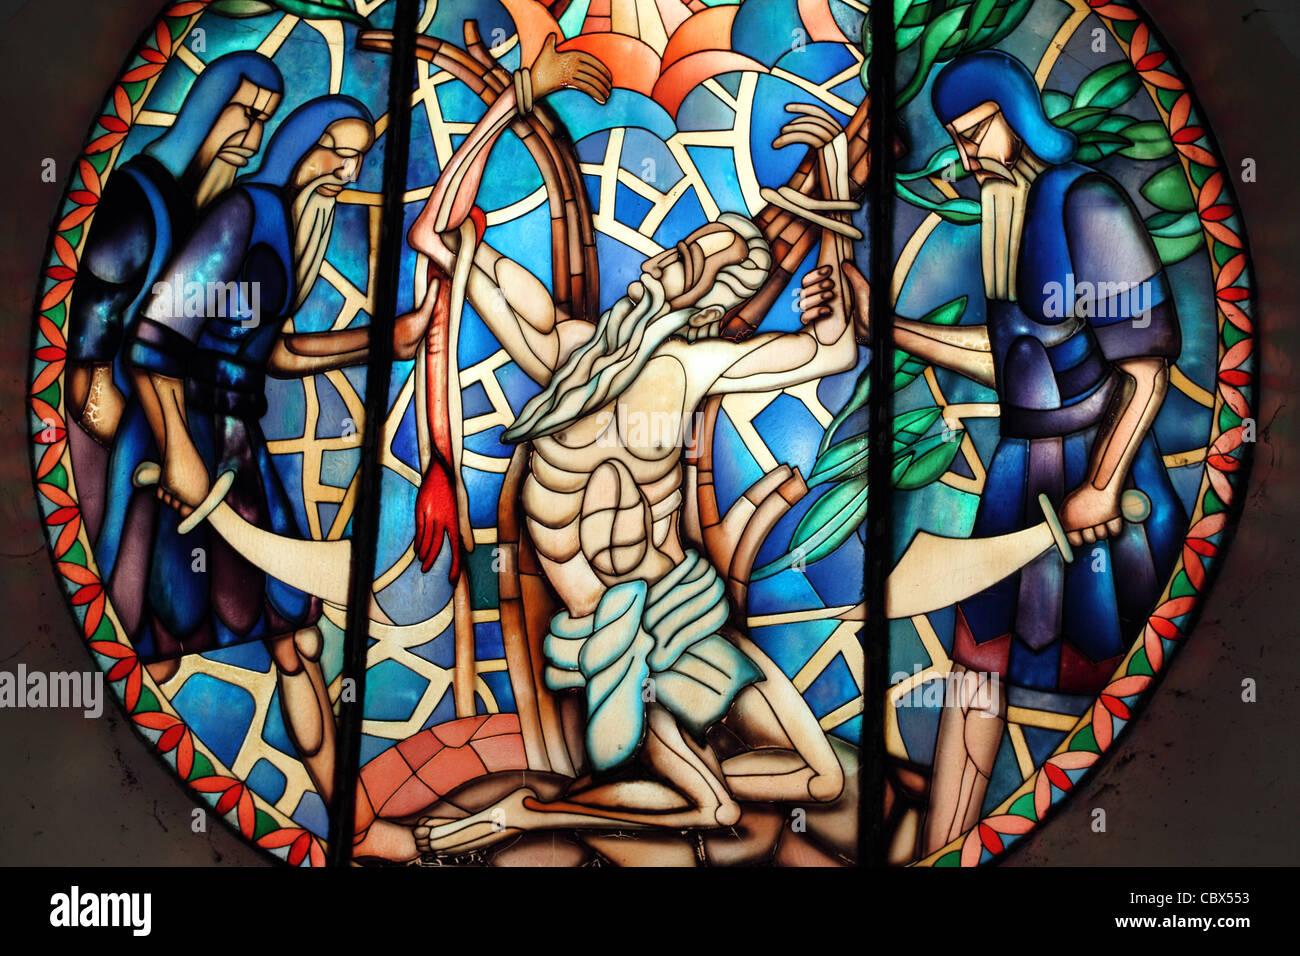 Stain glass window in Catholic Church of Jesus being sacrificed on the cross. Catbalogan, Samar Province, Visayas, - Stock Image